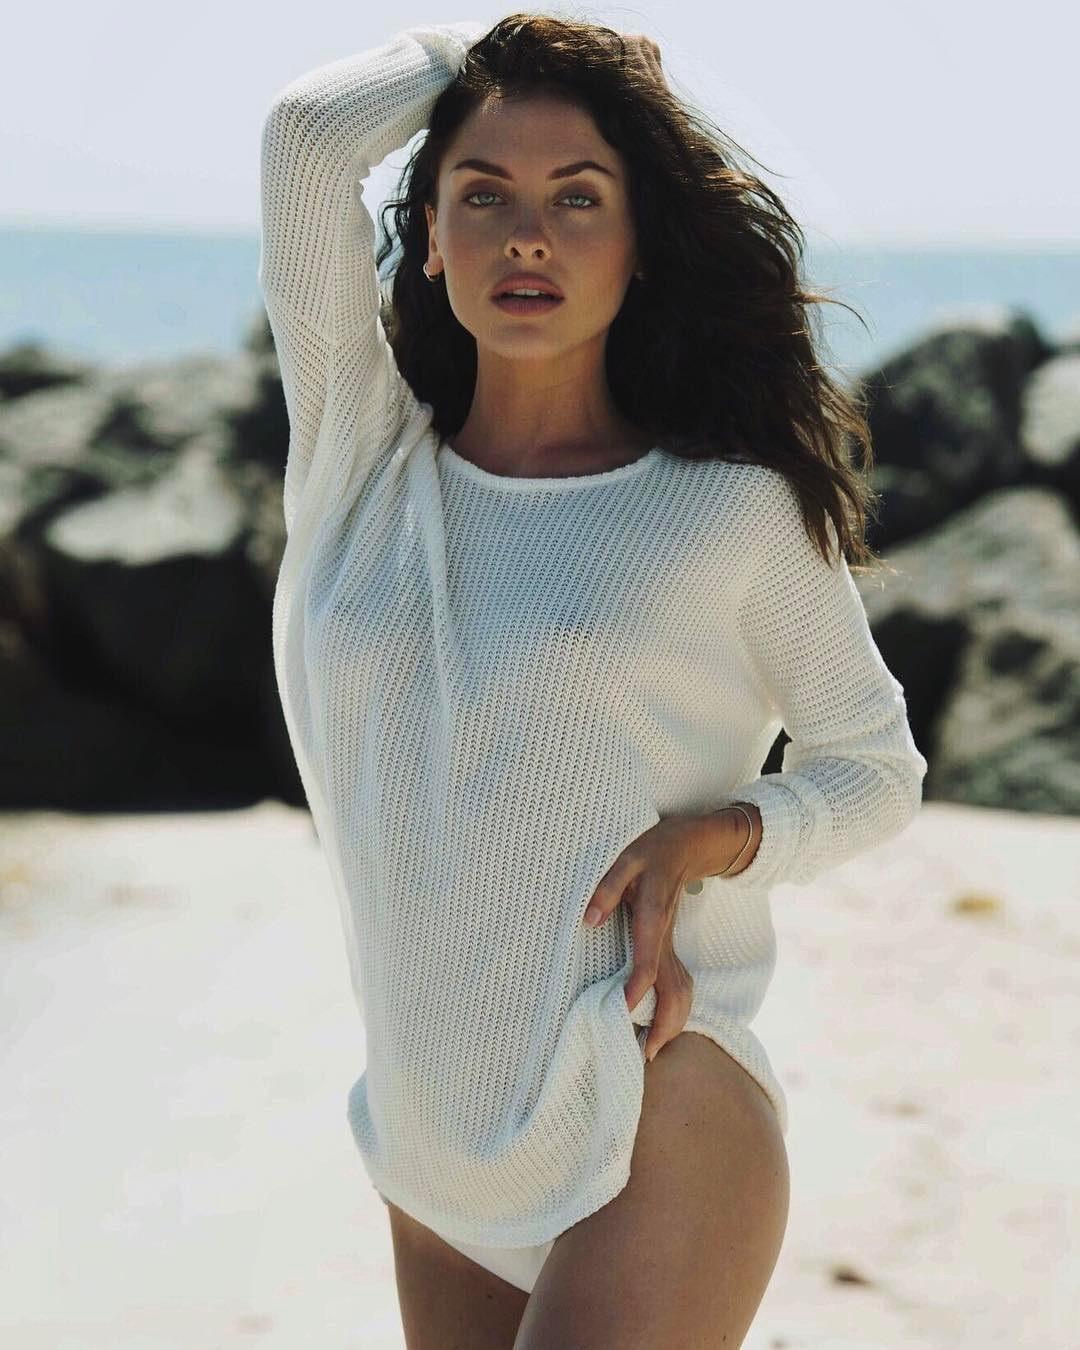 Эскорт модель Натали